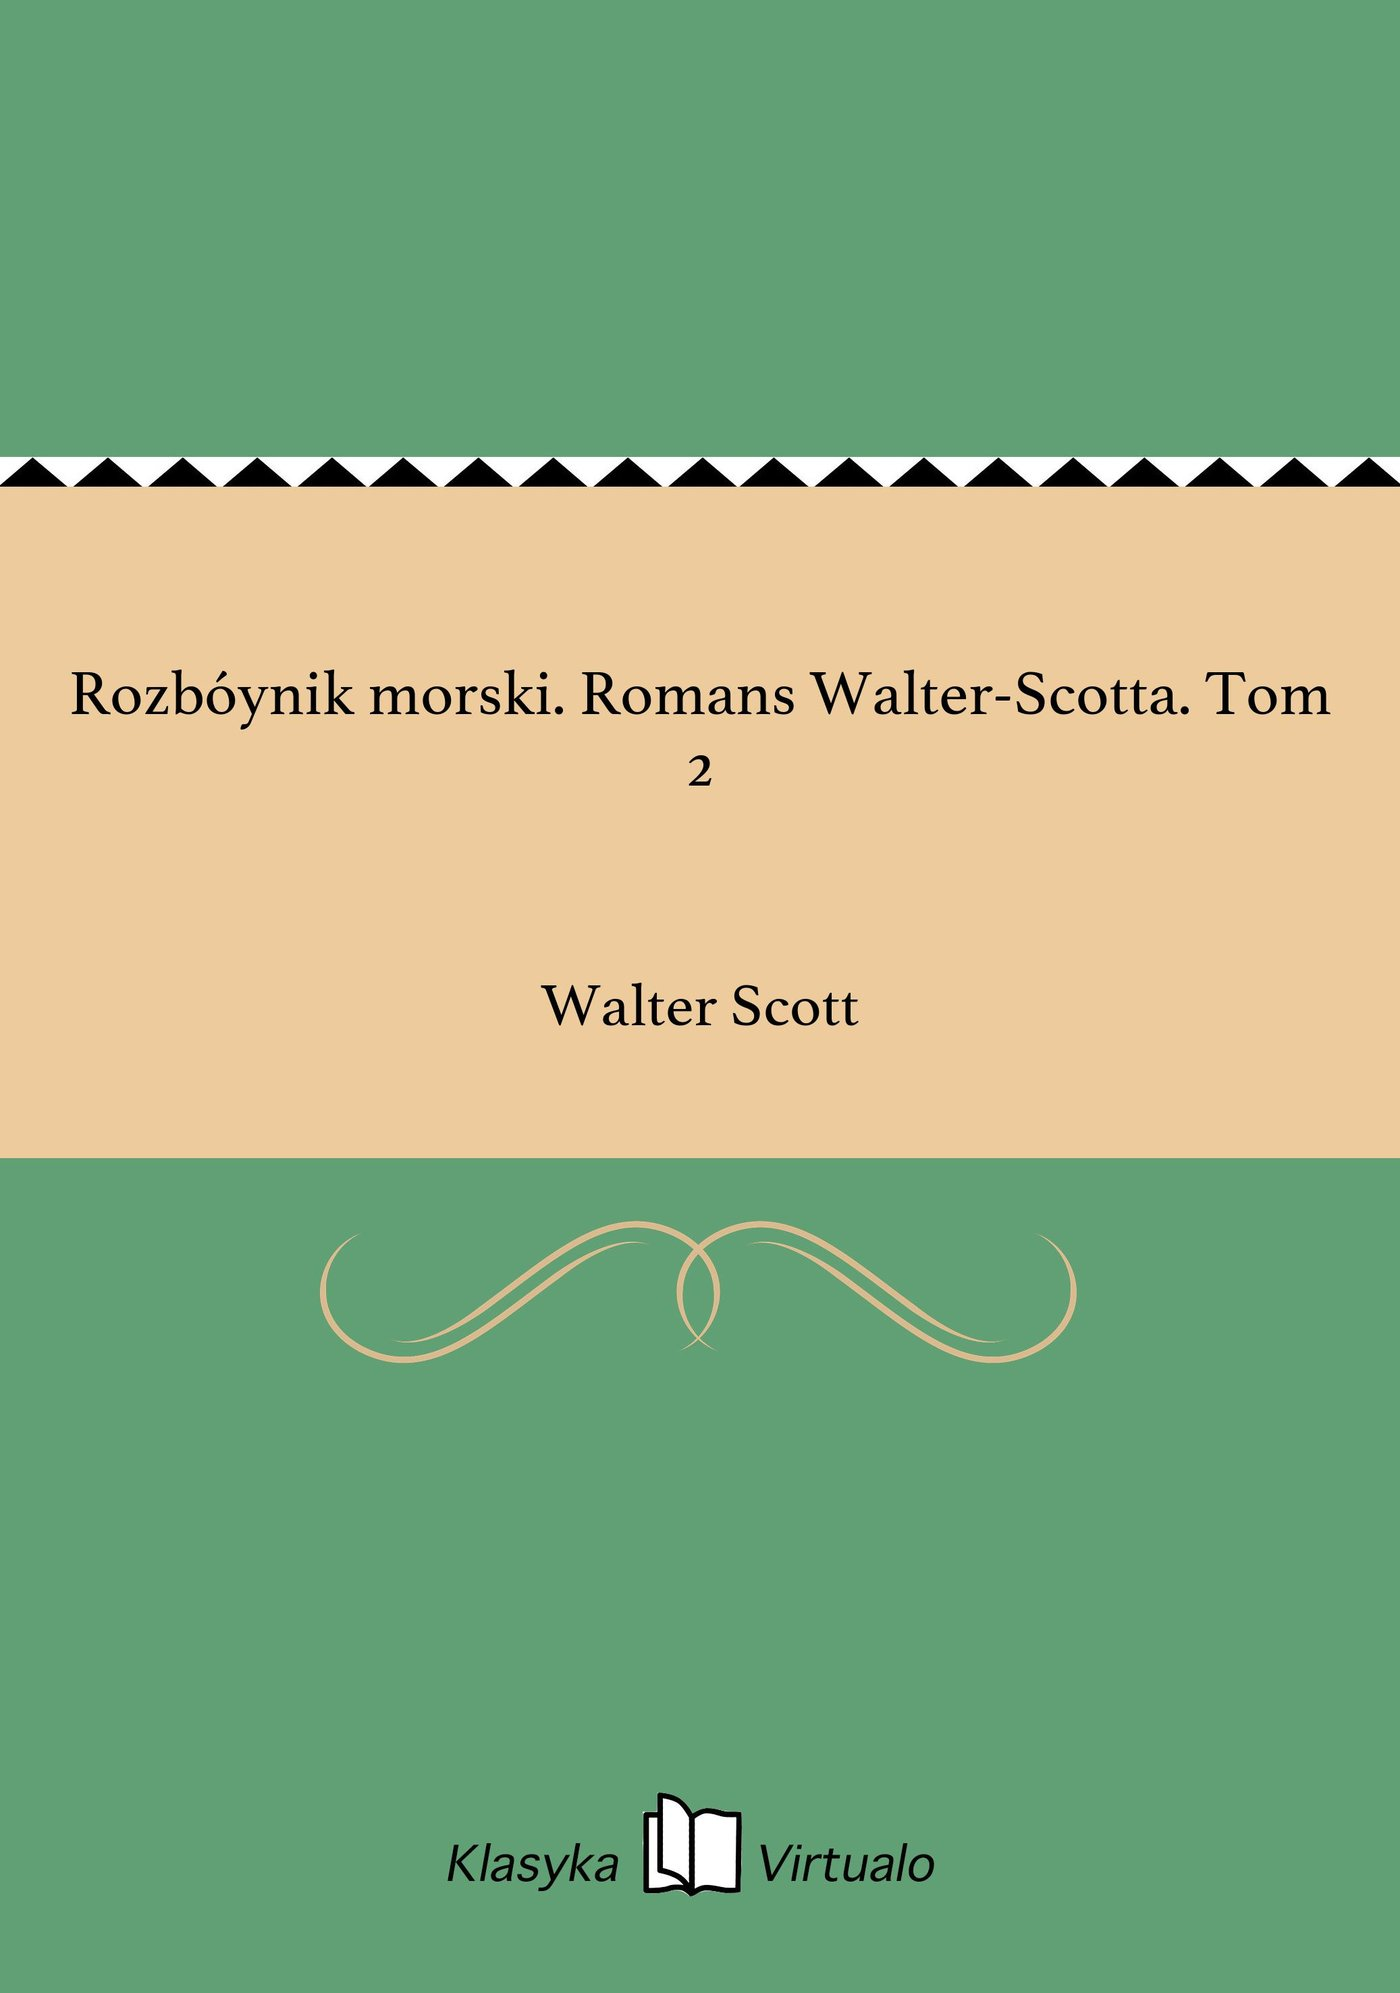 Rozbóynik morski. Romans Walter-Scotta. Tom 2 - Ebook (Książka na Kindle) do pobrania w formacie MOBI